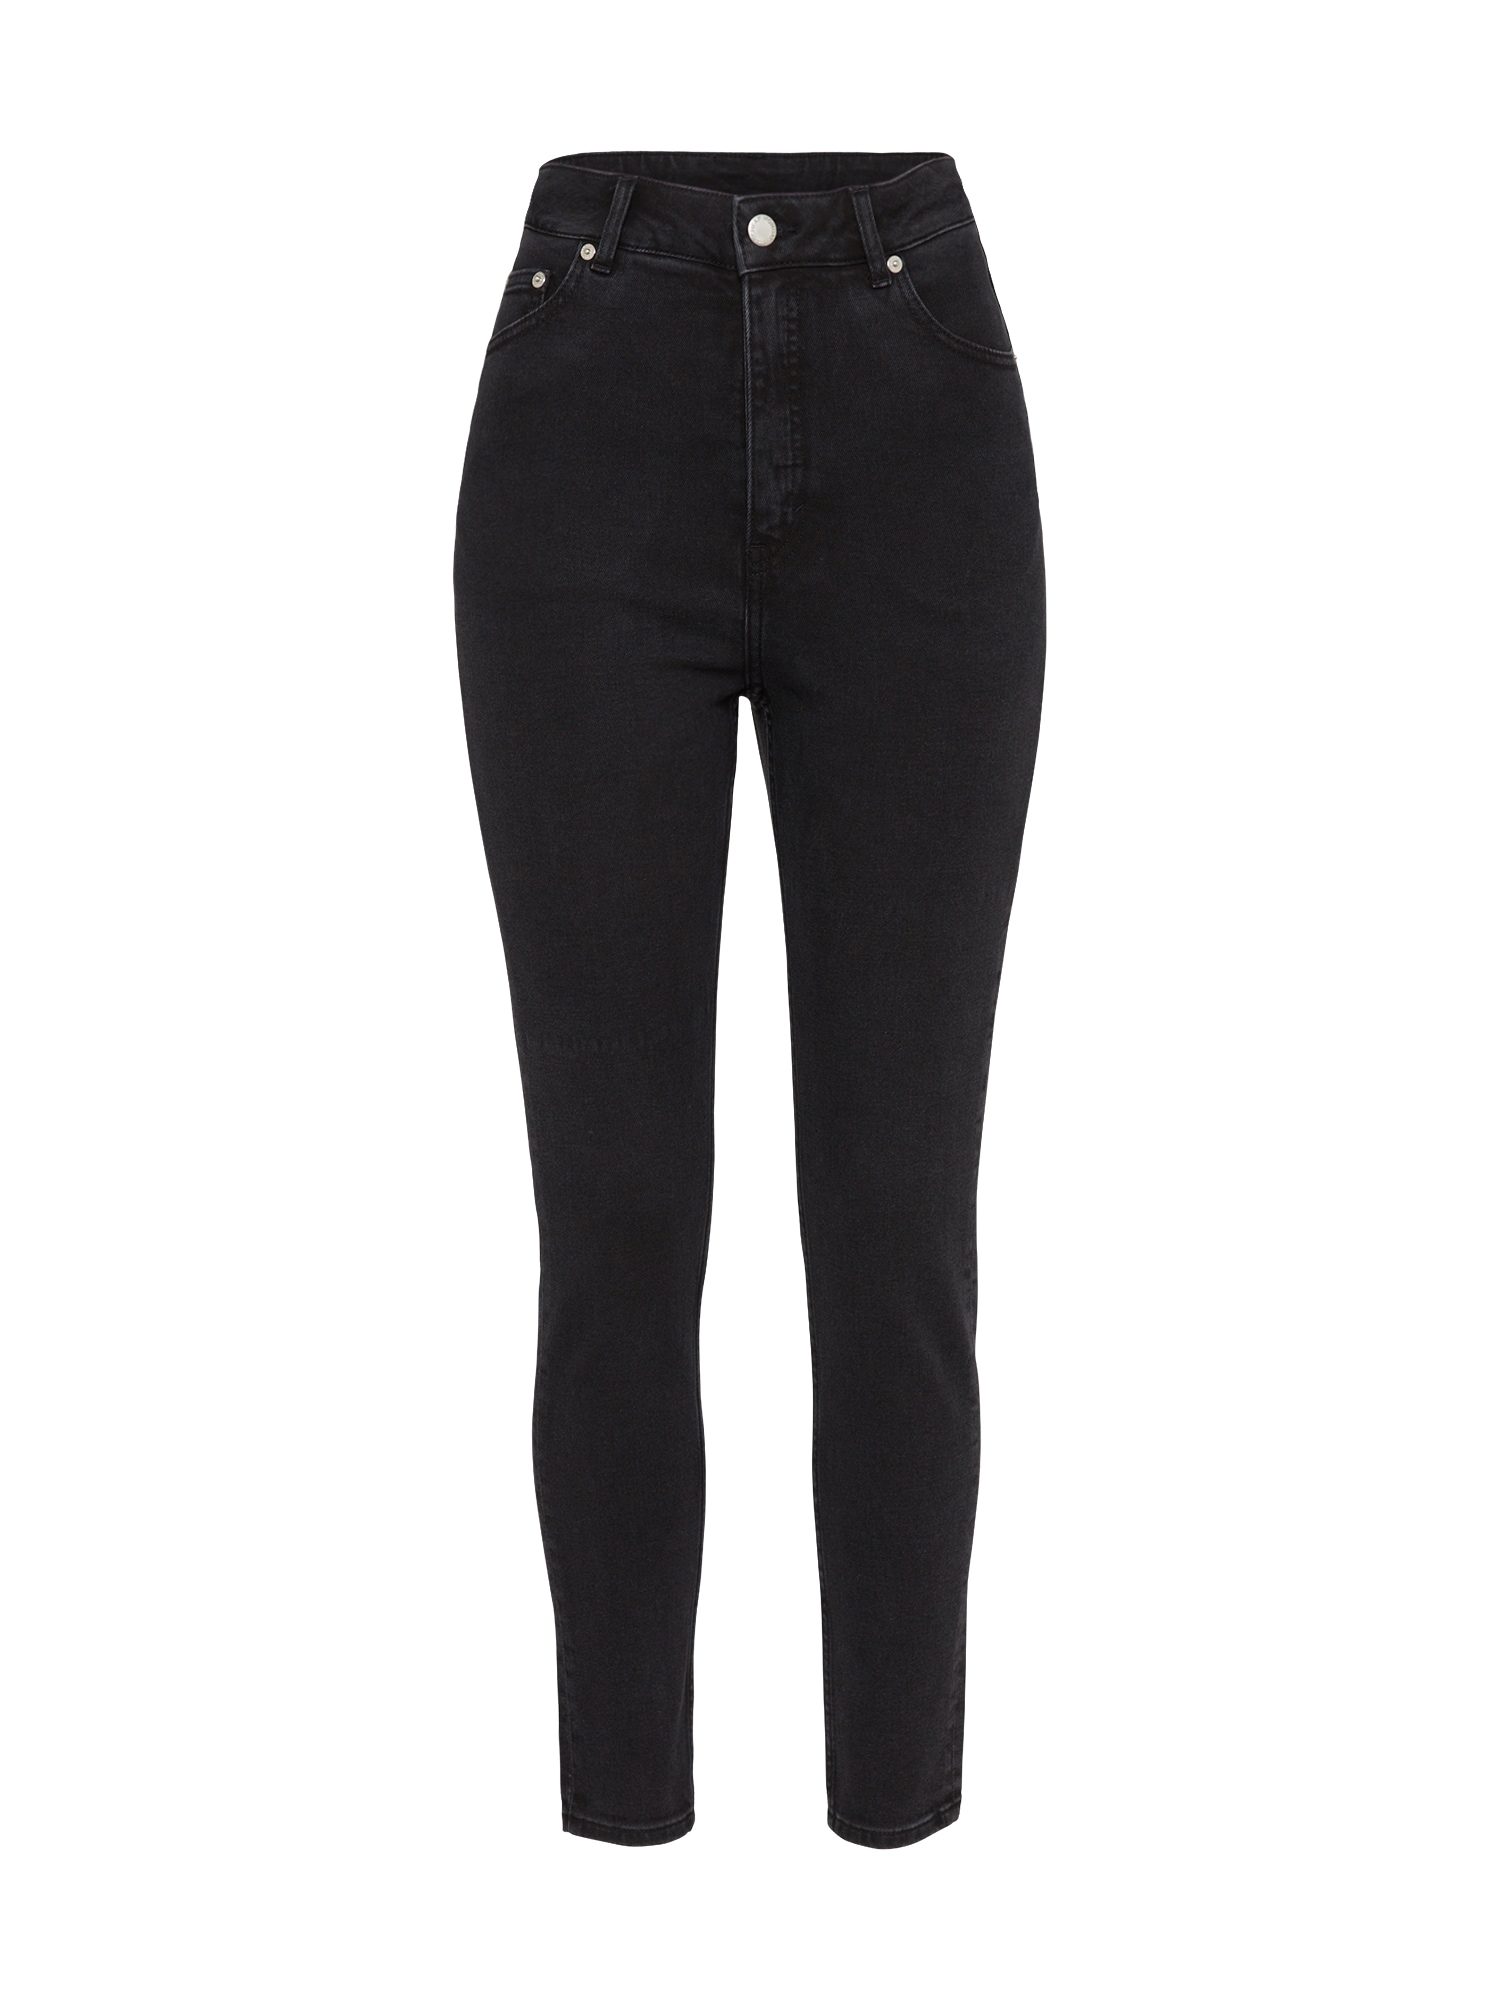 CHEAP MONDAY Dames Jeans Donna black denim